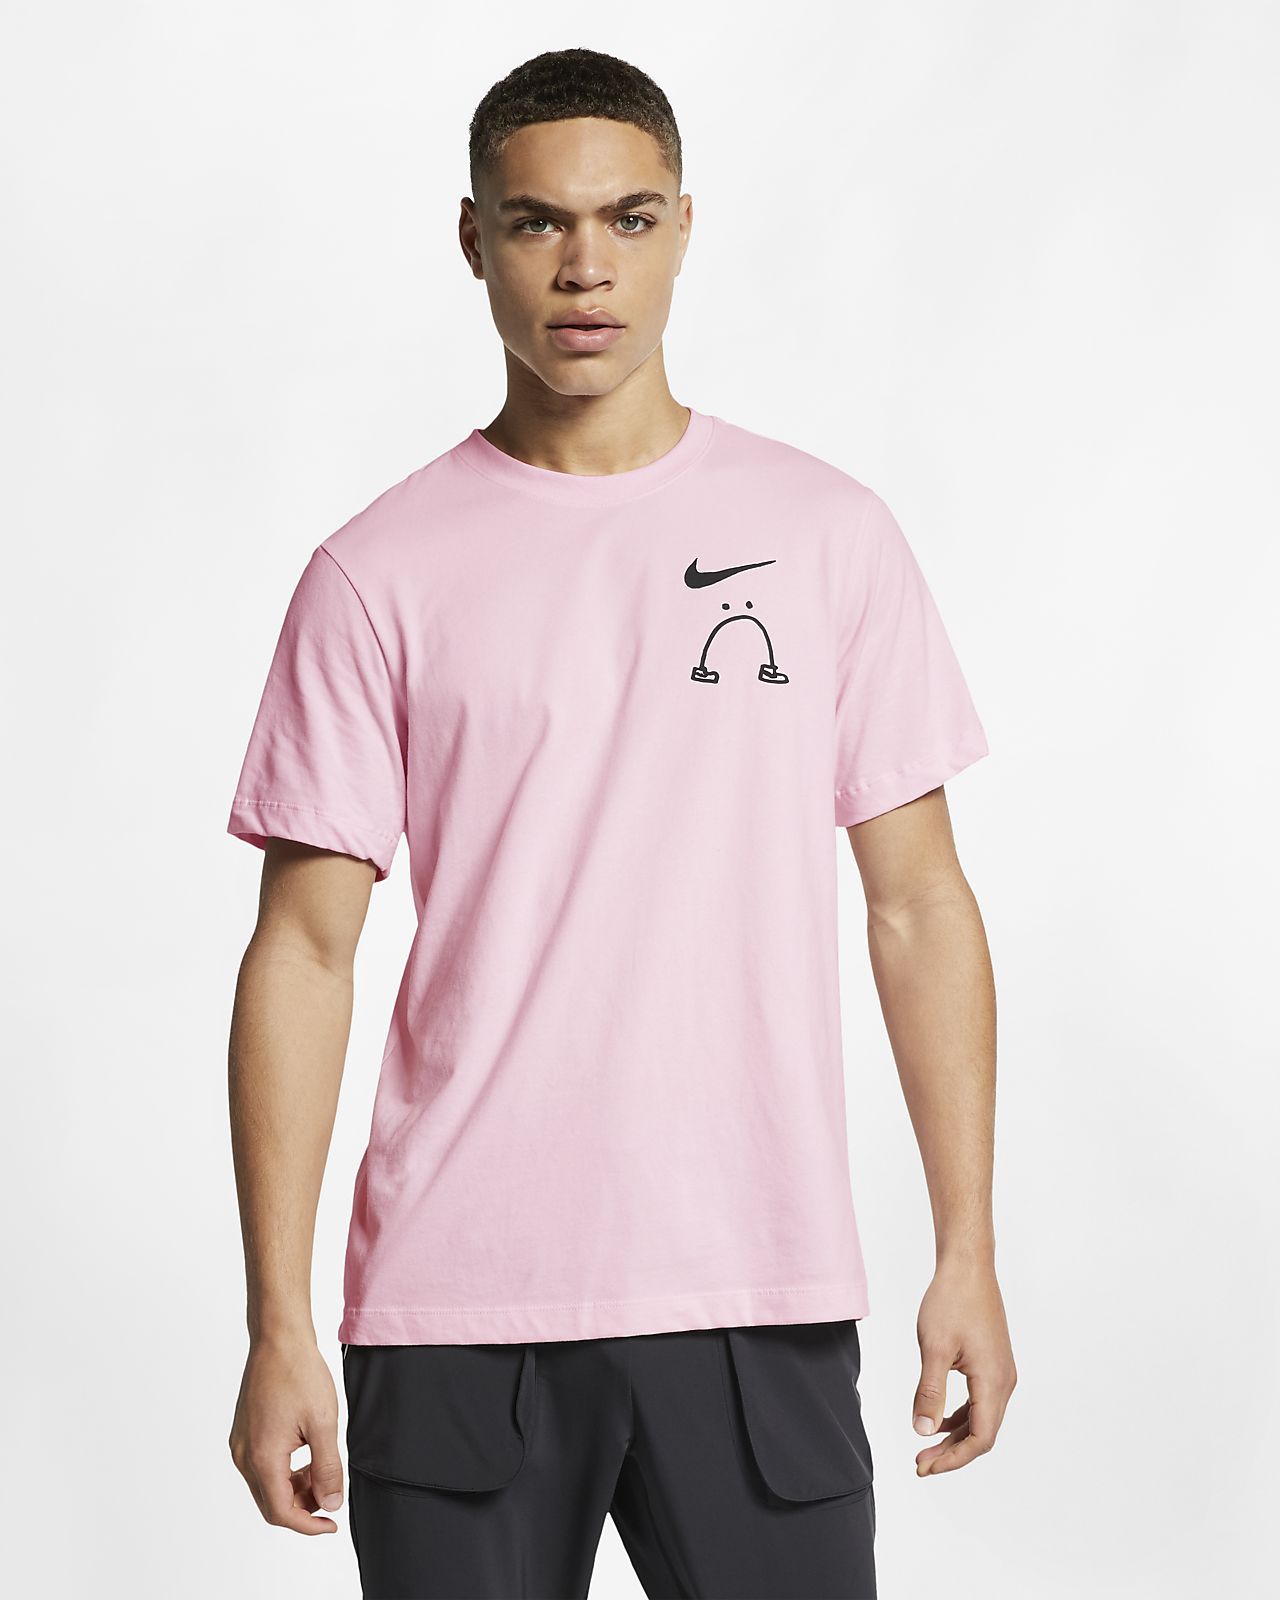 Tee-shirt de running Nike Dri-FIT Nathan Bell pour Homme